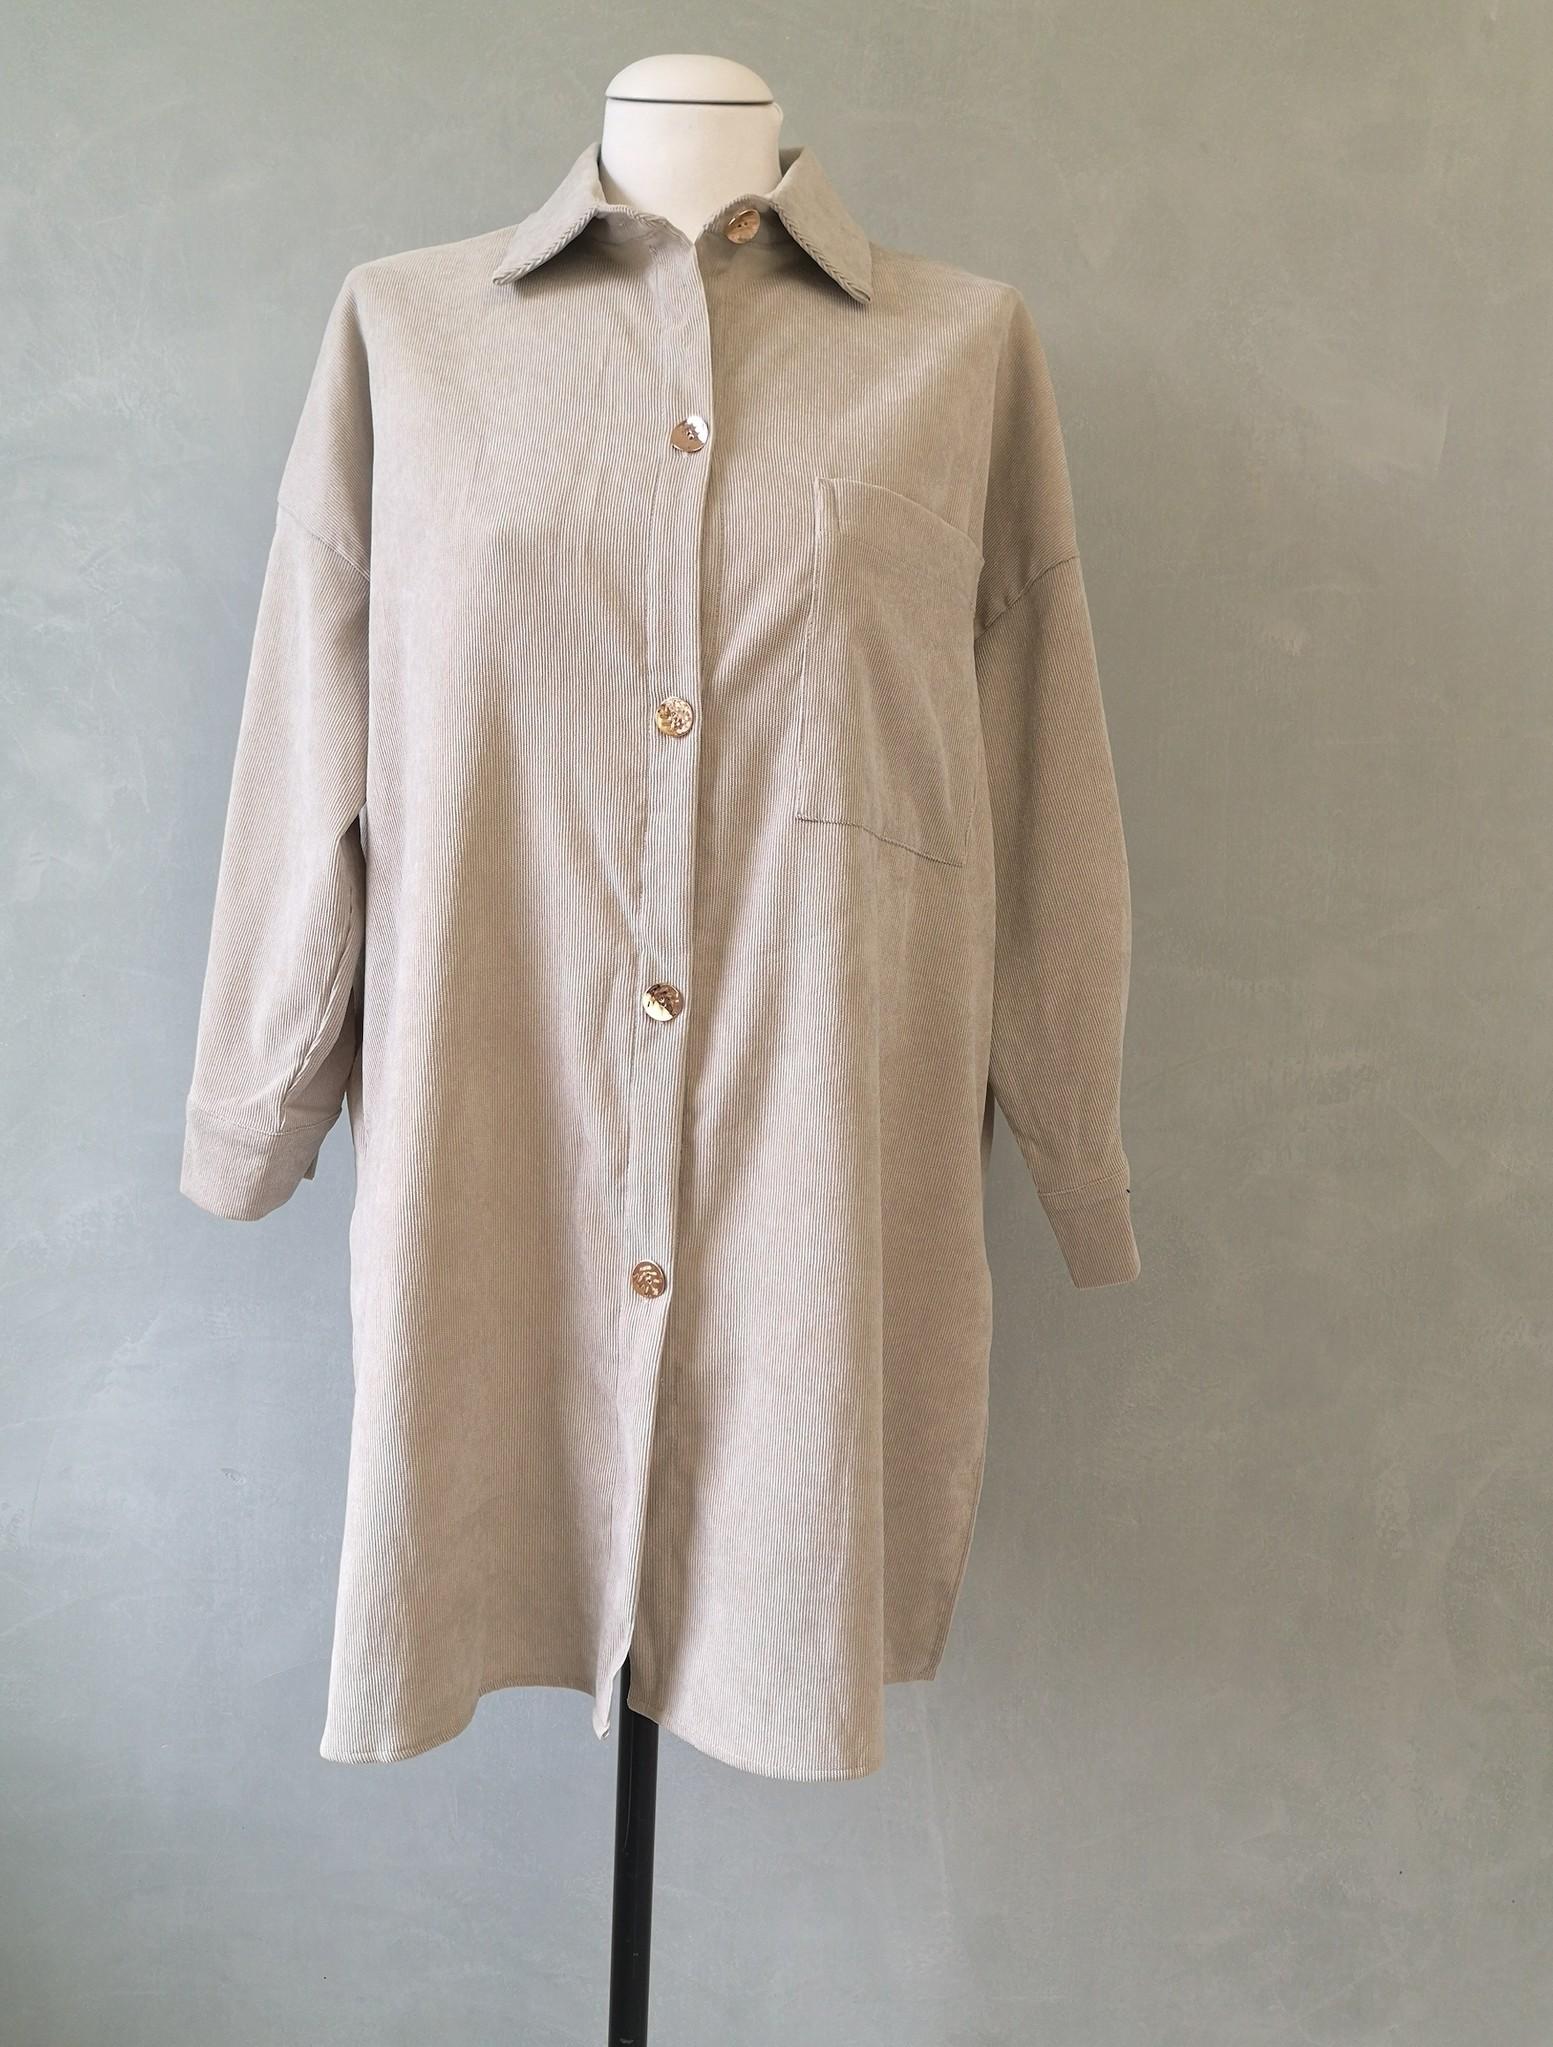 Curduroy shirt antelao off-white